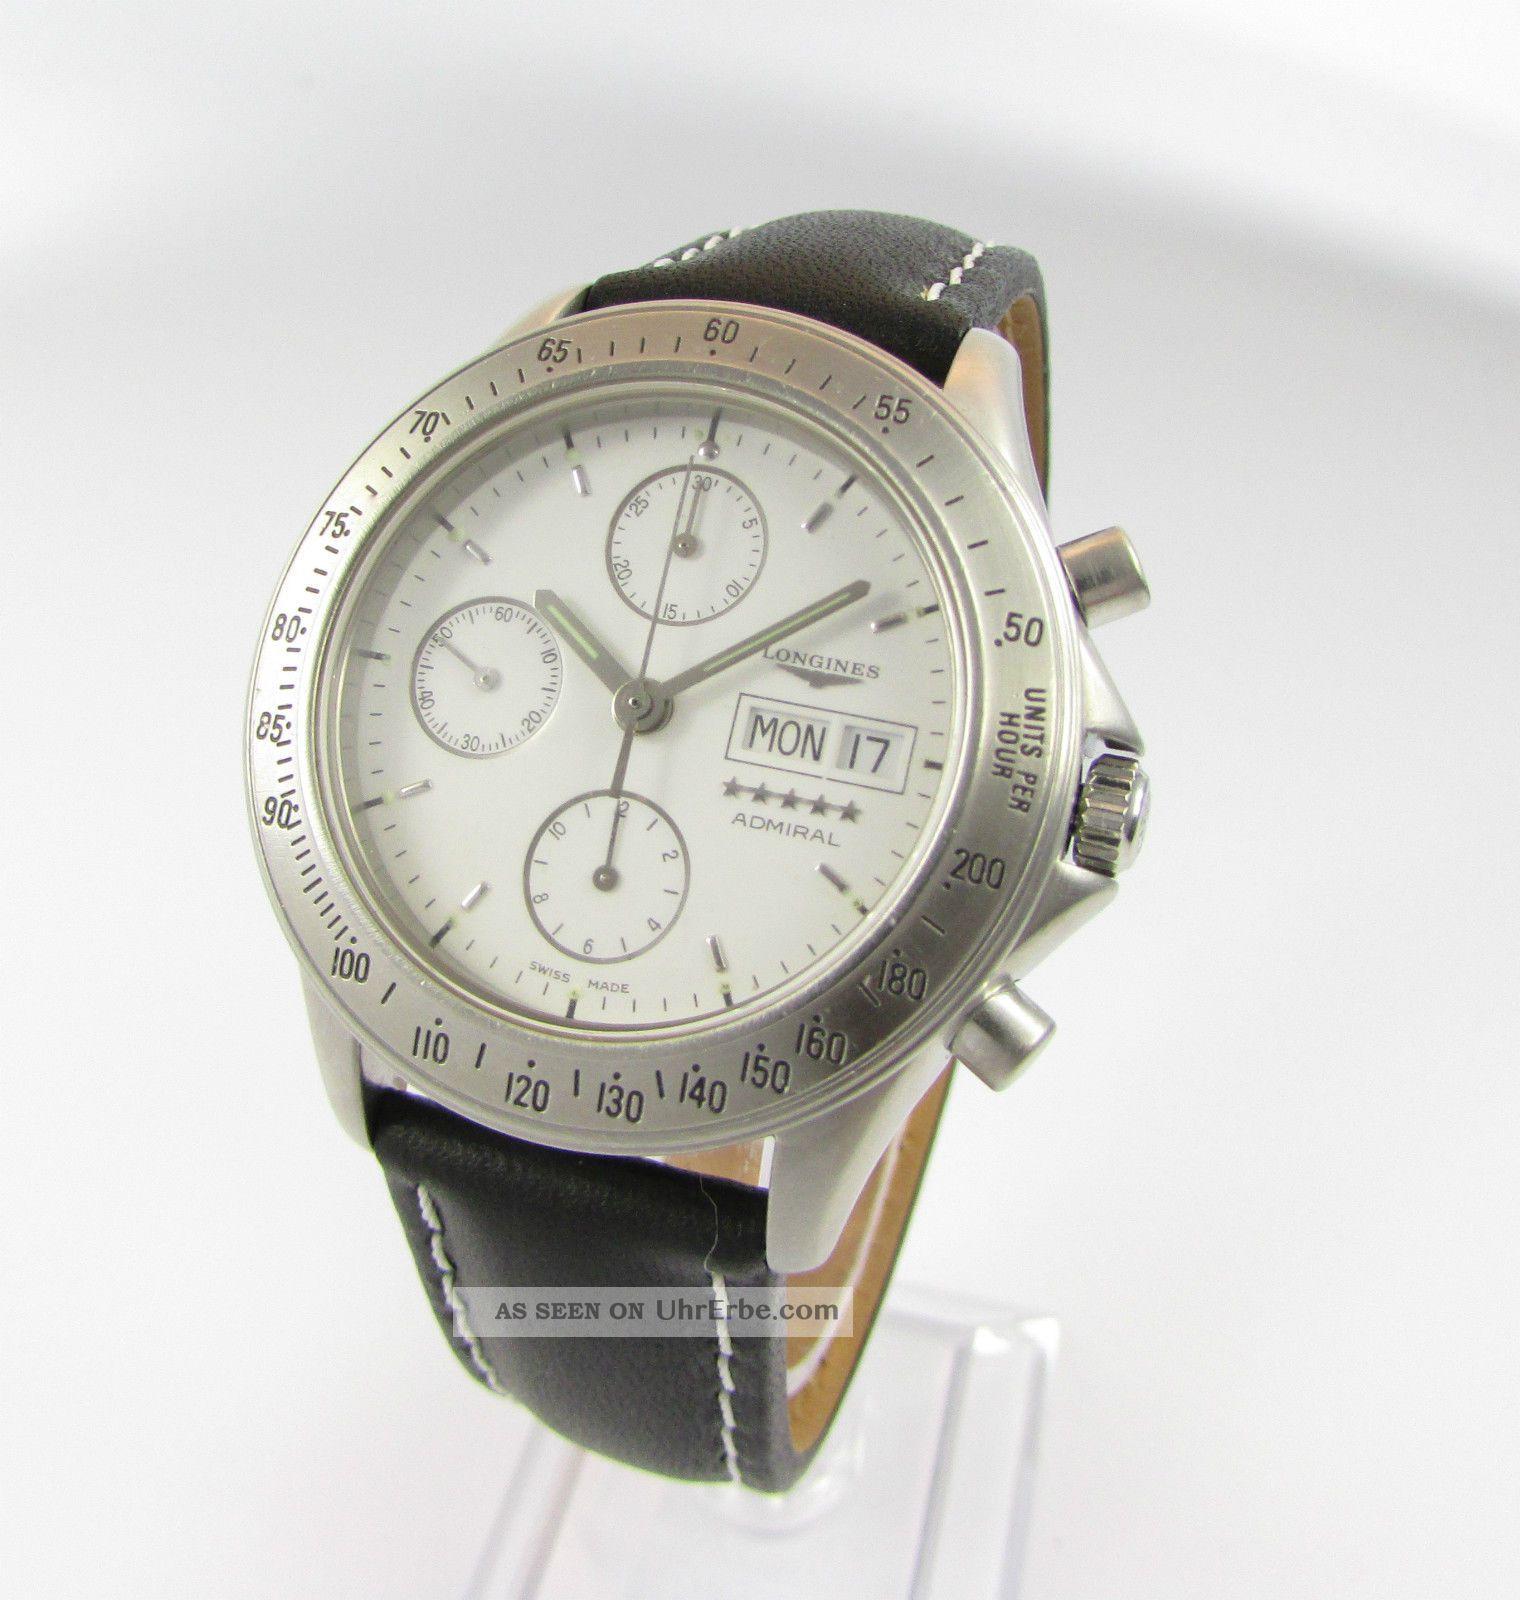 Longines Admiral Day/ Date Automatik Chronograph - Valjoux 7750 - Topzustand Armbanduhren Bild